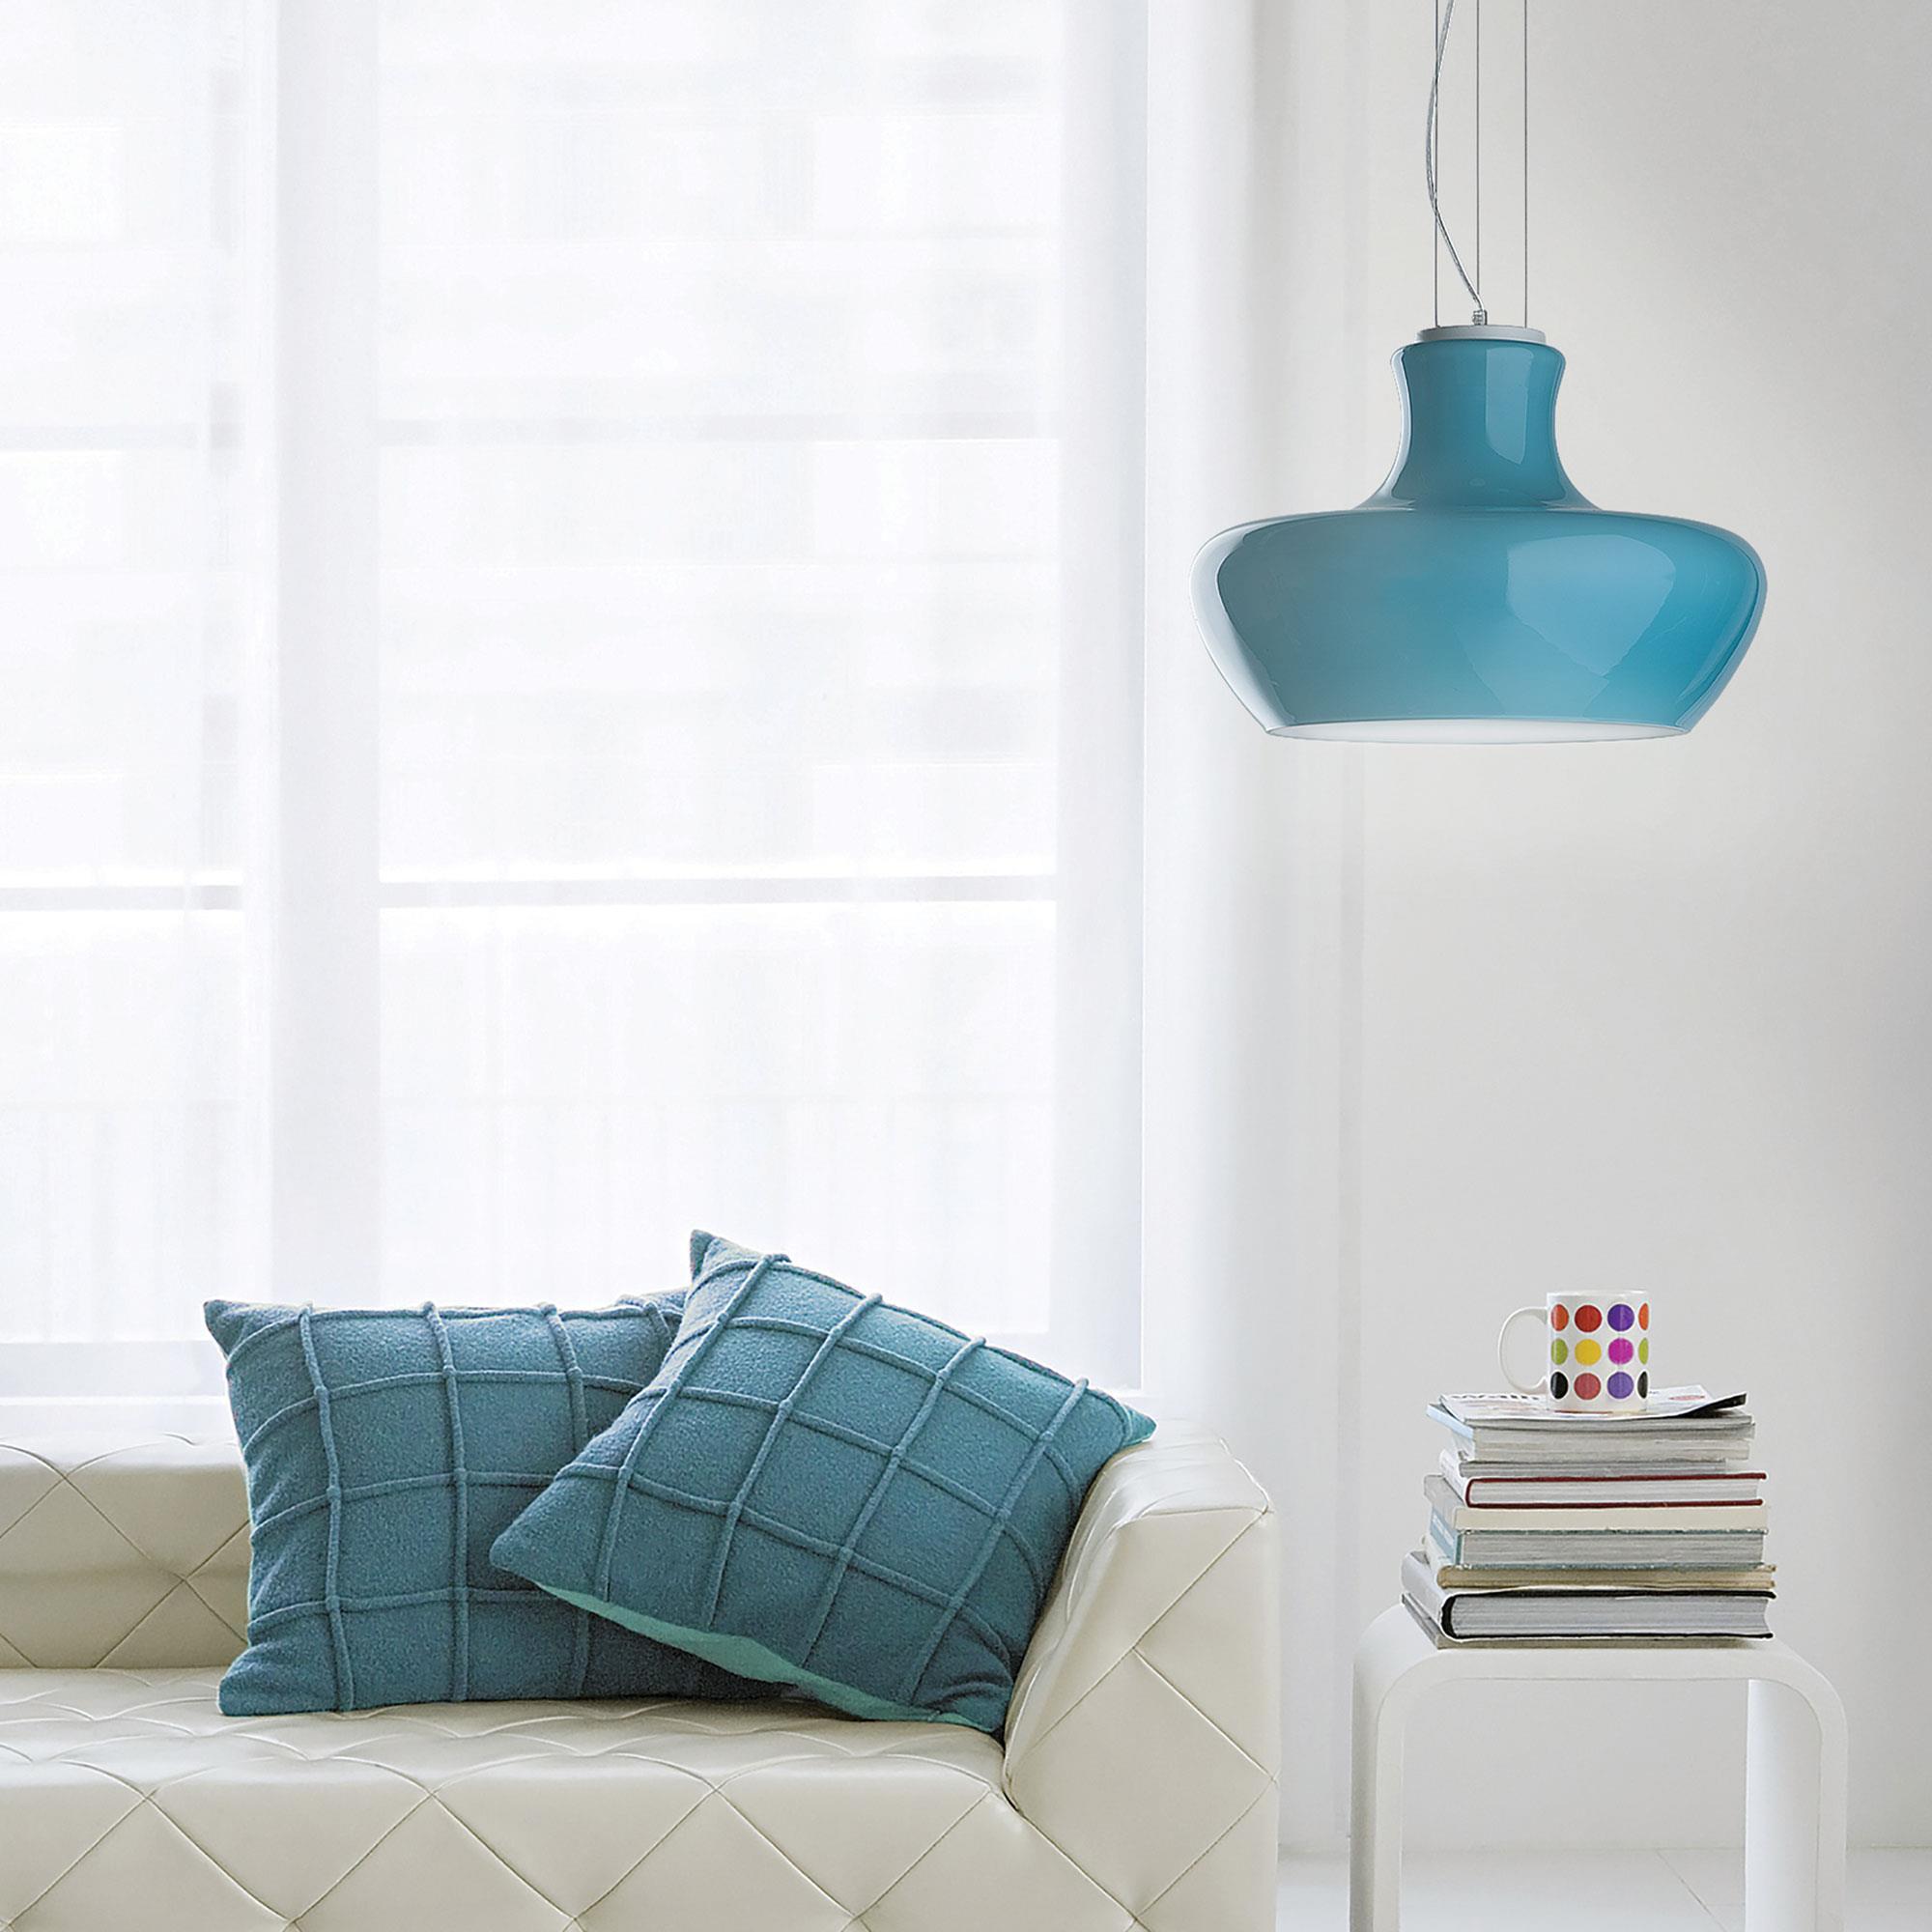 Ideal Lux 137292 ALADINO SP1 D30 Azzurro függeszték